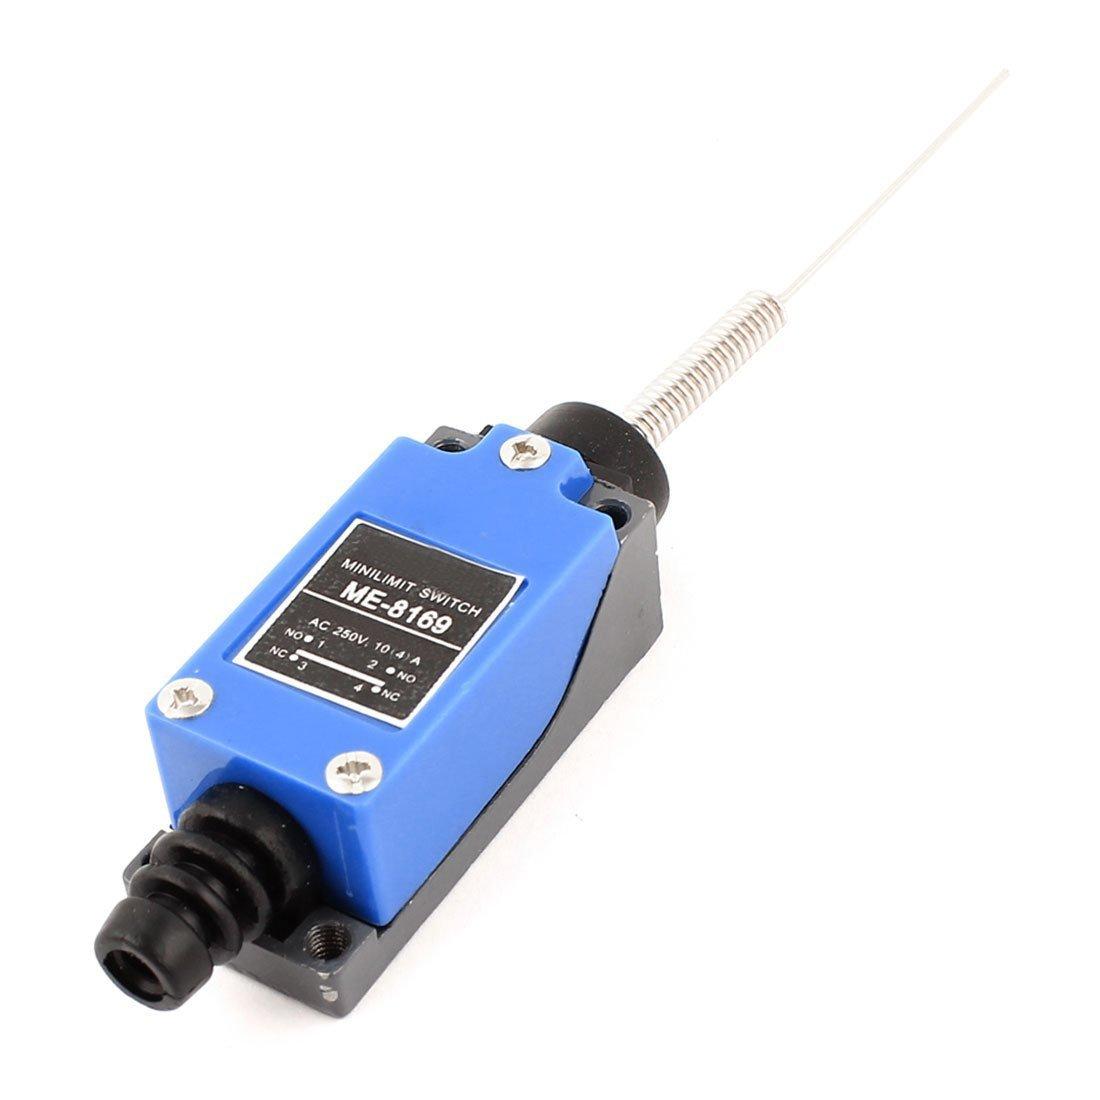 51sdm4wNSdL._SL1100_ limit switches on quadra bigfoot hydraulic levelling systems rv bigfoot leveling system wiring diagram at honlapkeszites.co